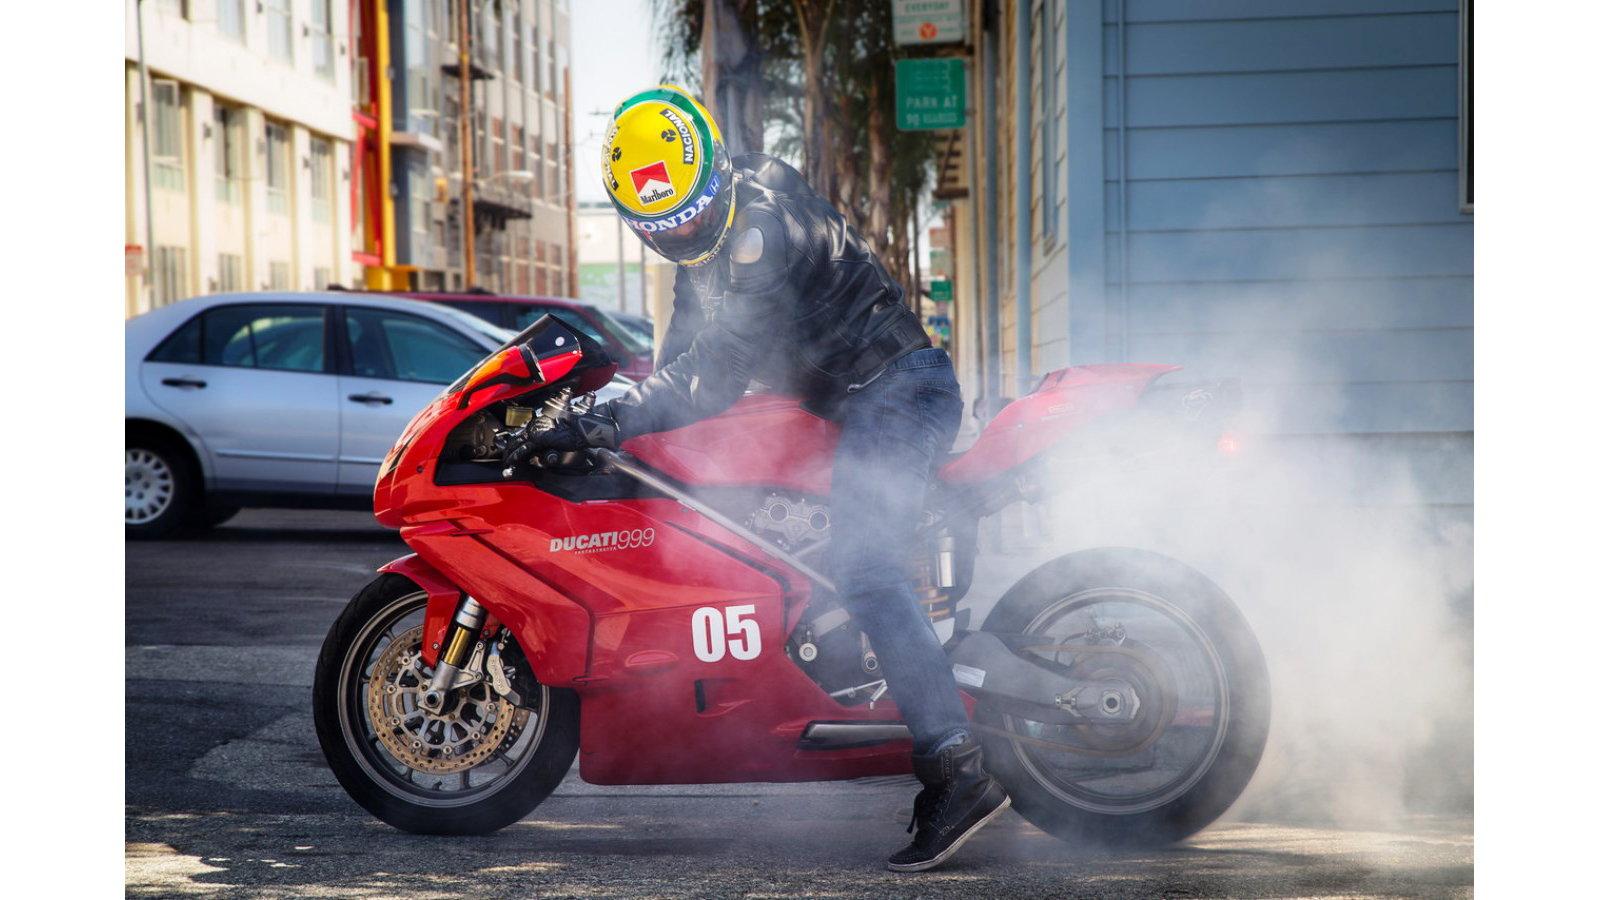 Motorcycles, sportbikes